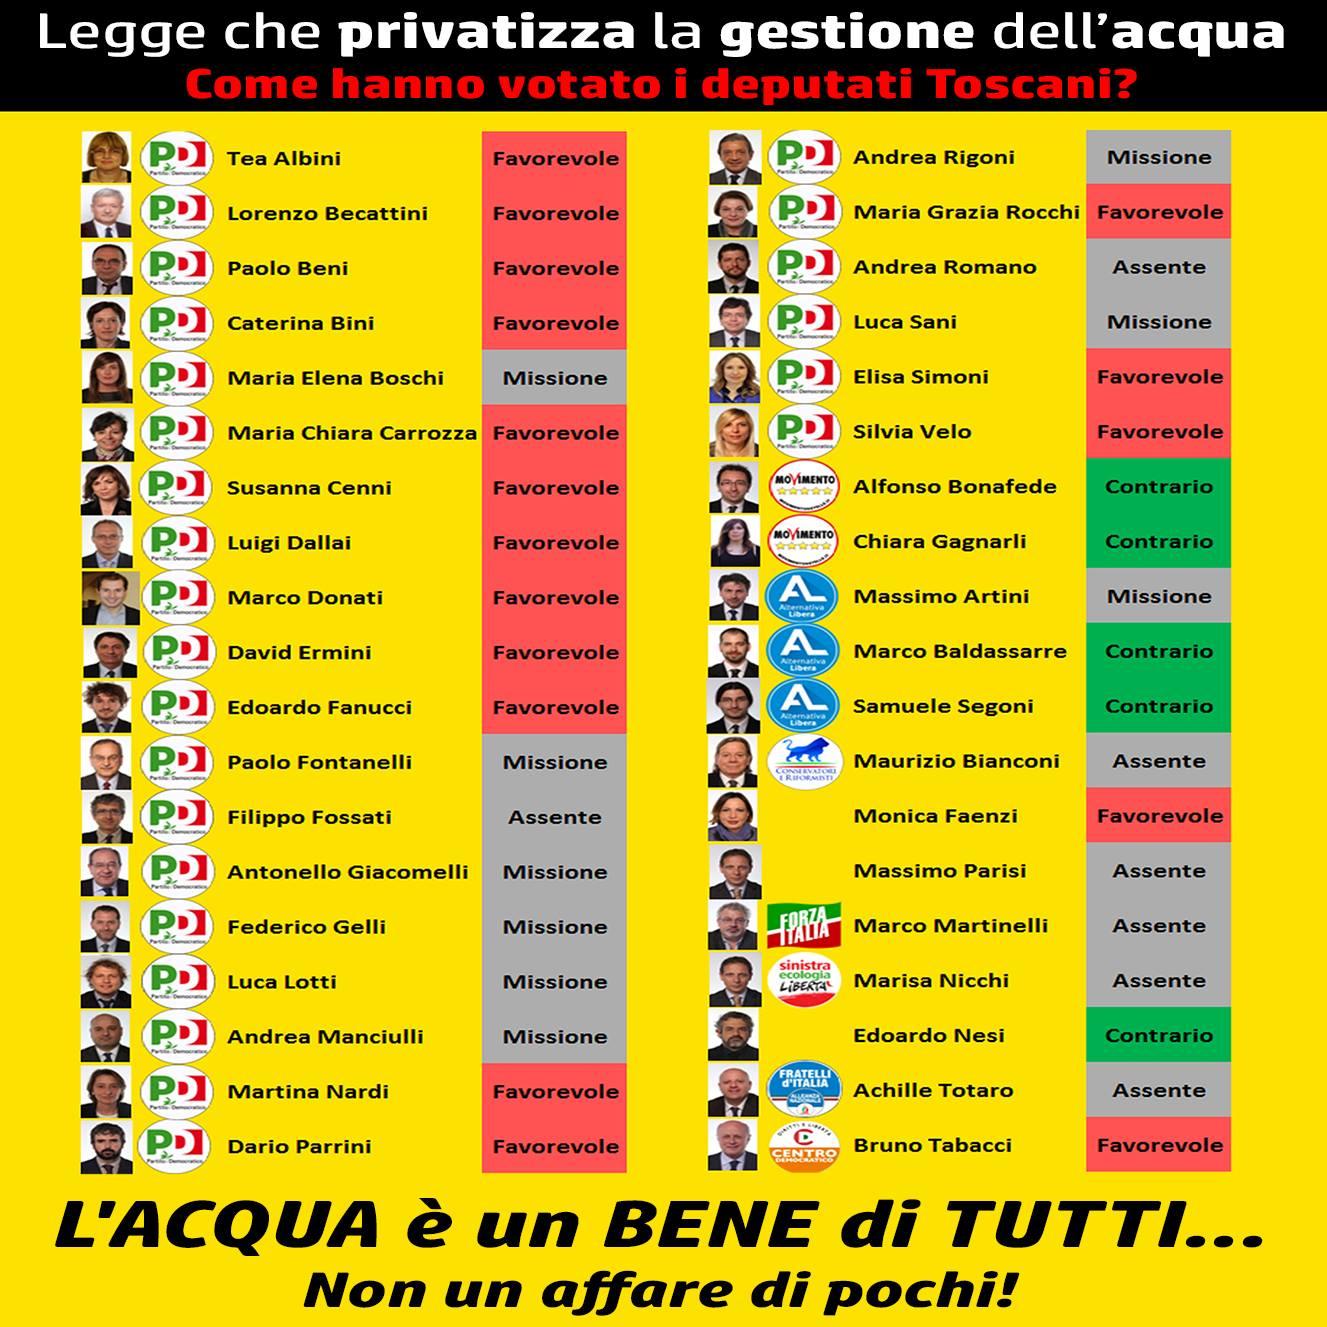 Votanti Toscani Acqua Privata